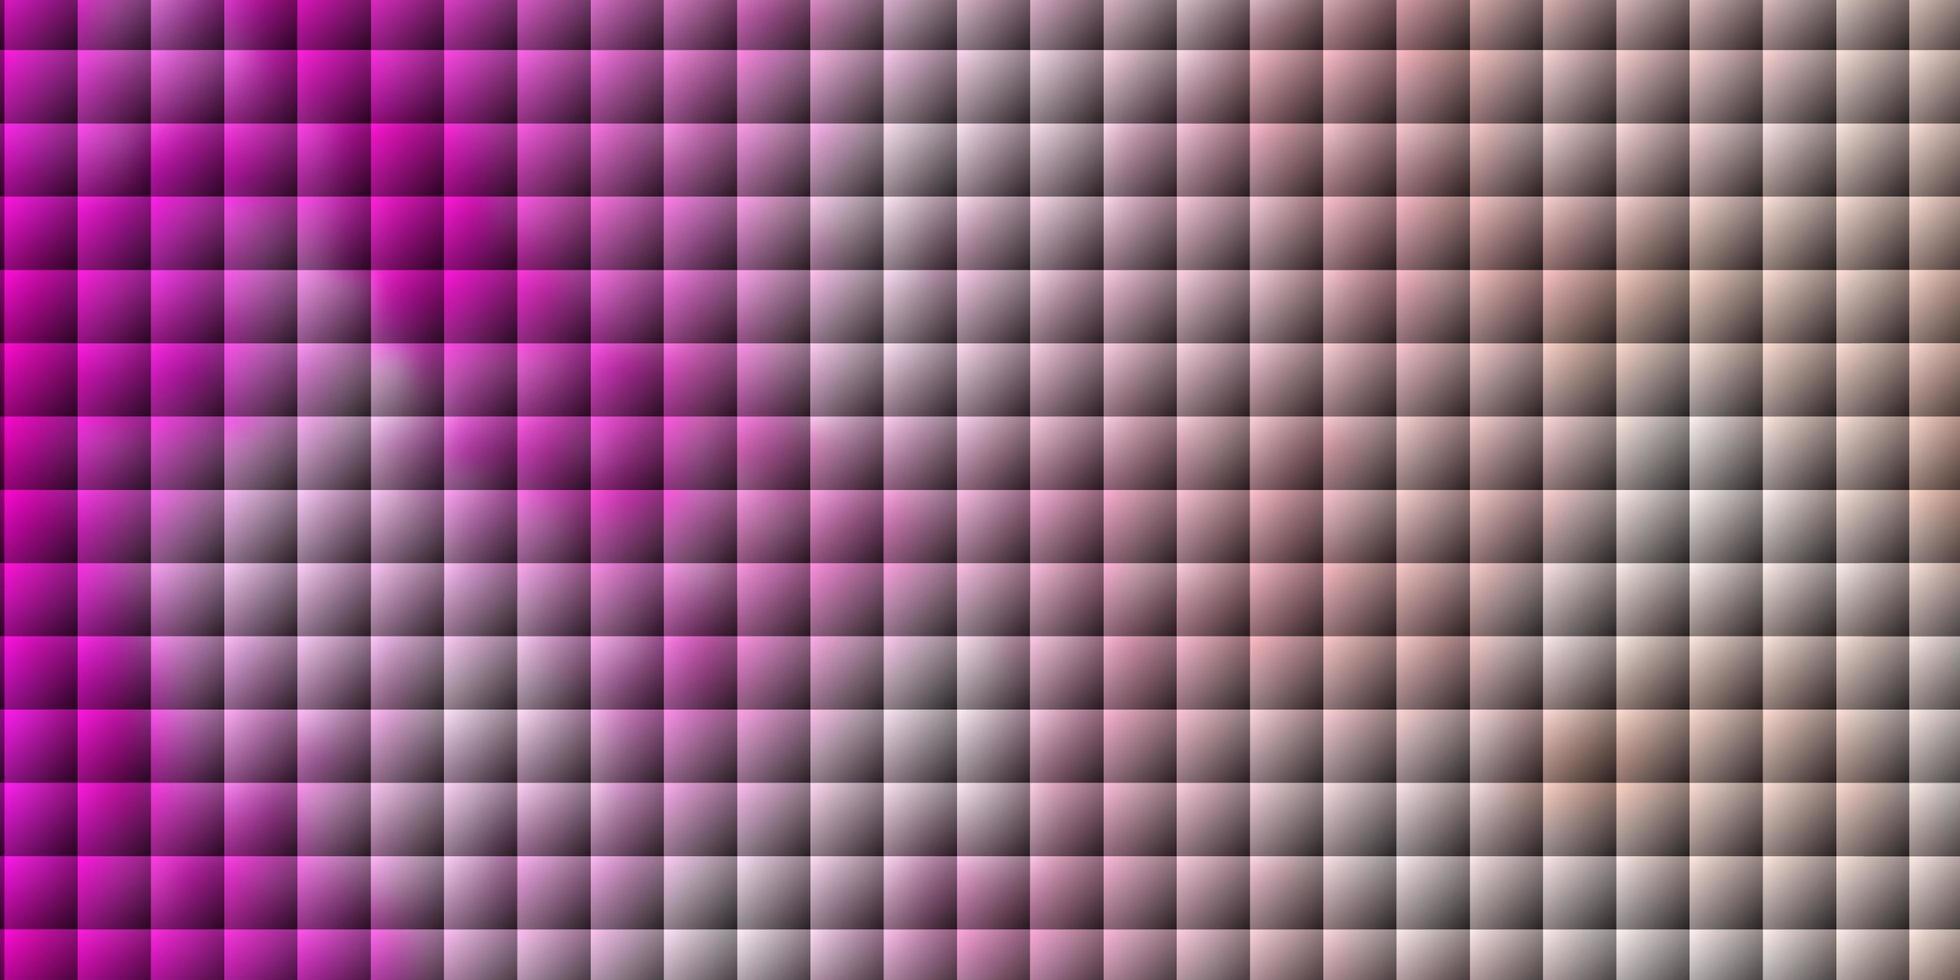 textura vector rosa claro em estilo retangular.